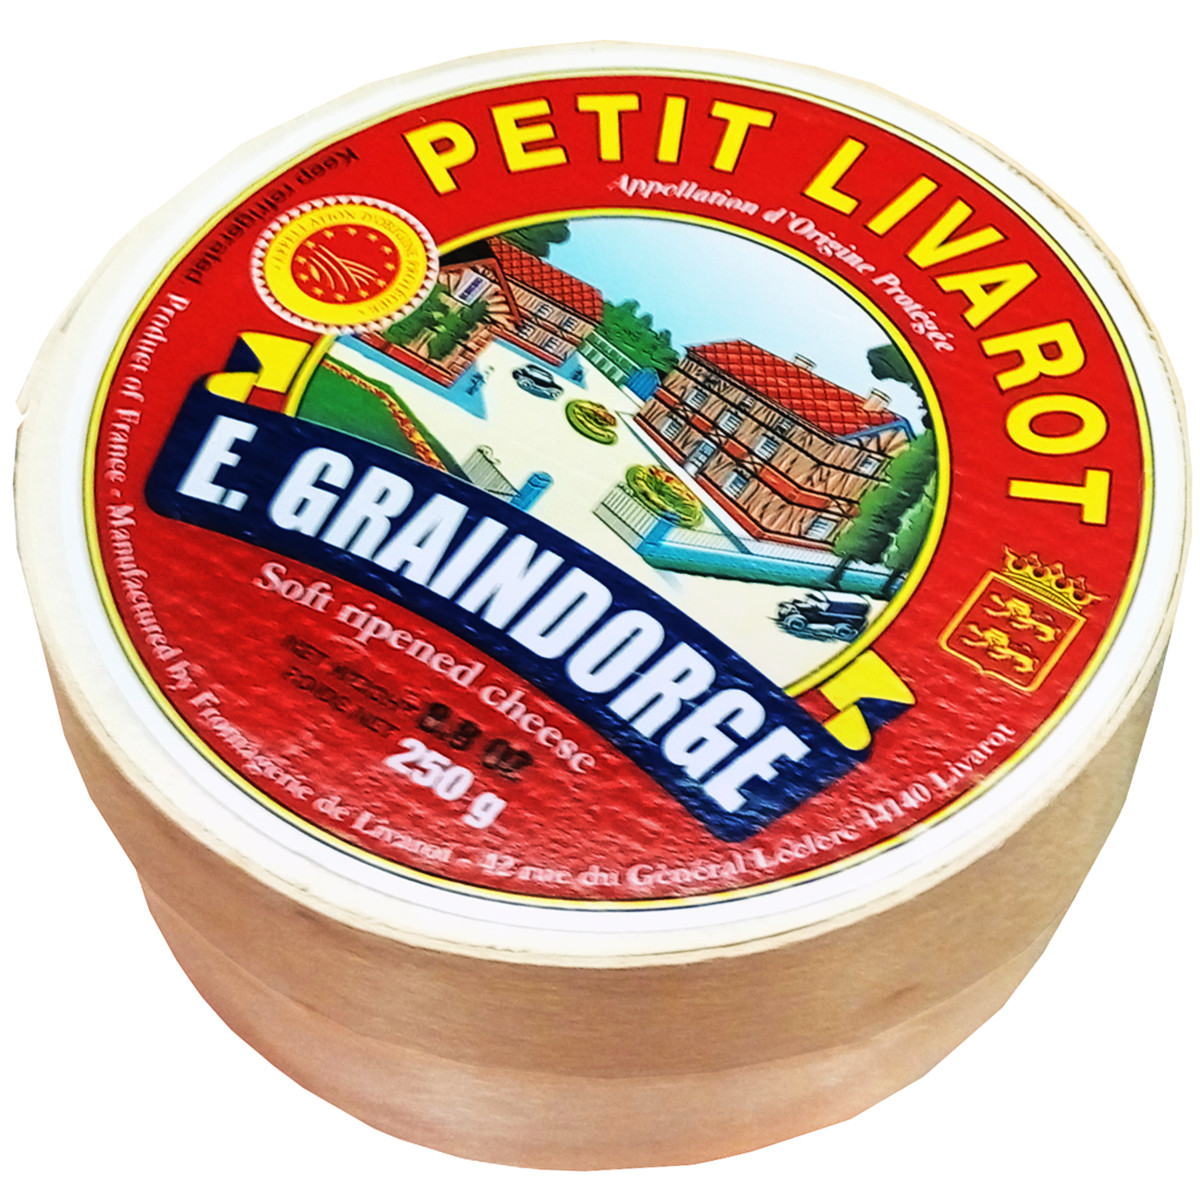 Сыр французский Петит Ливаро 250грамм